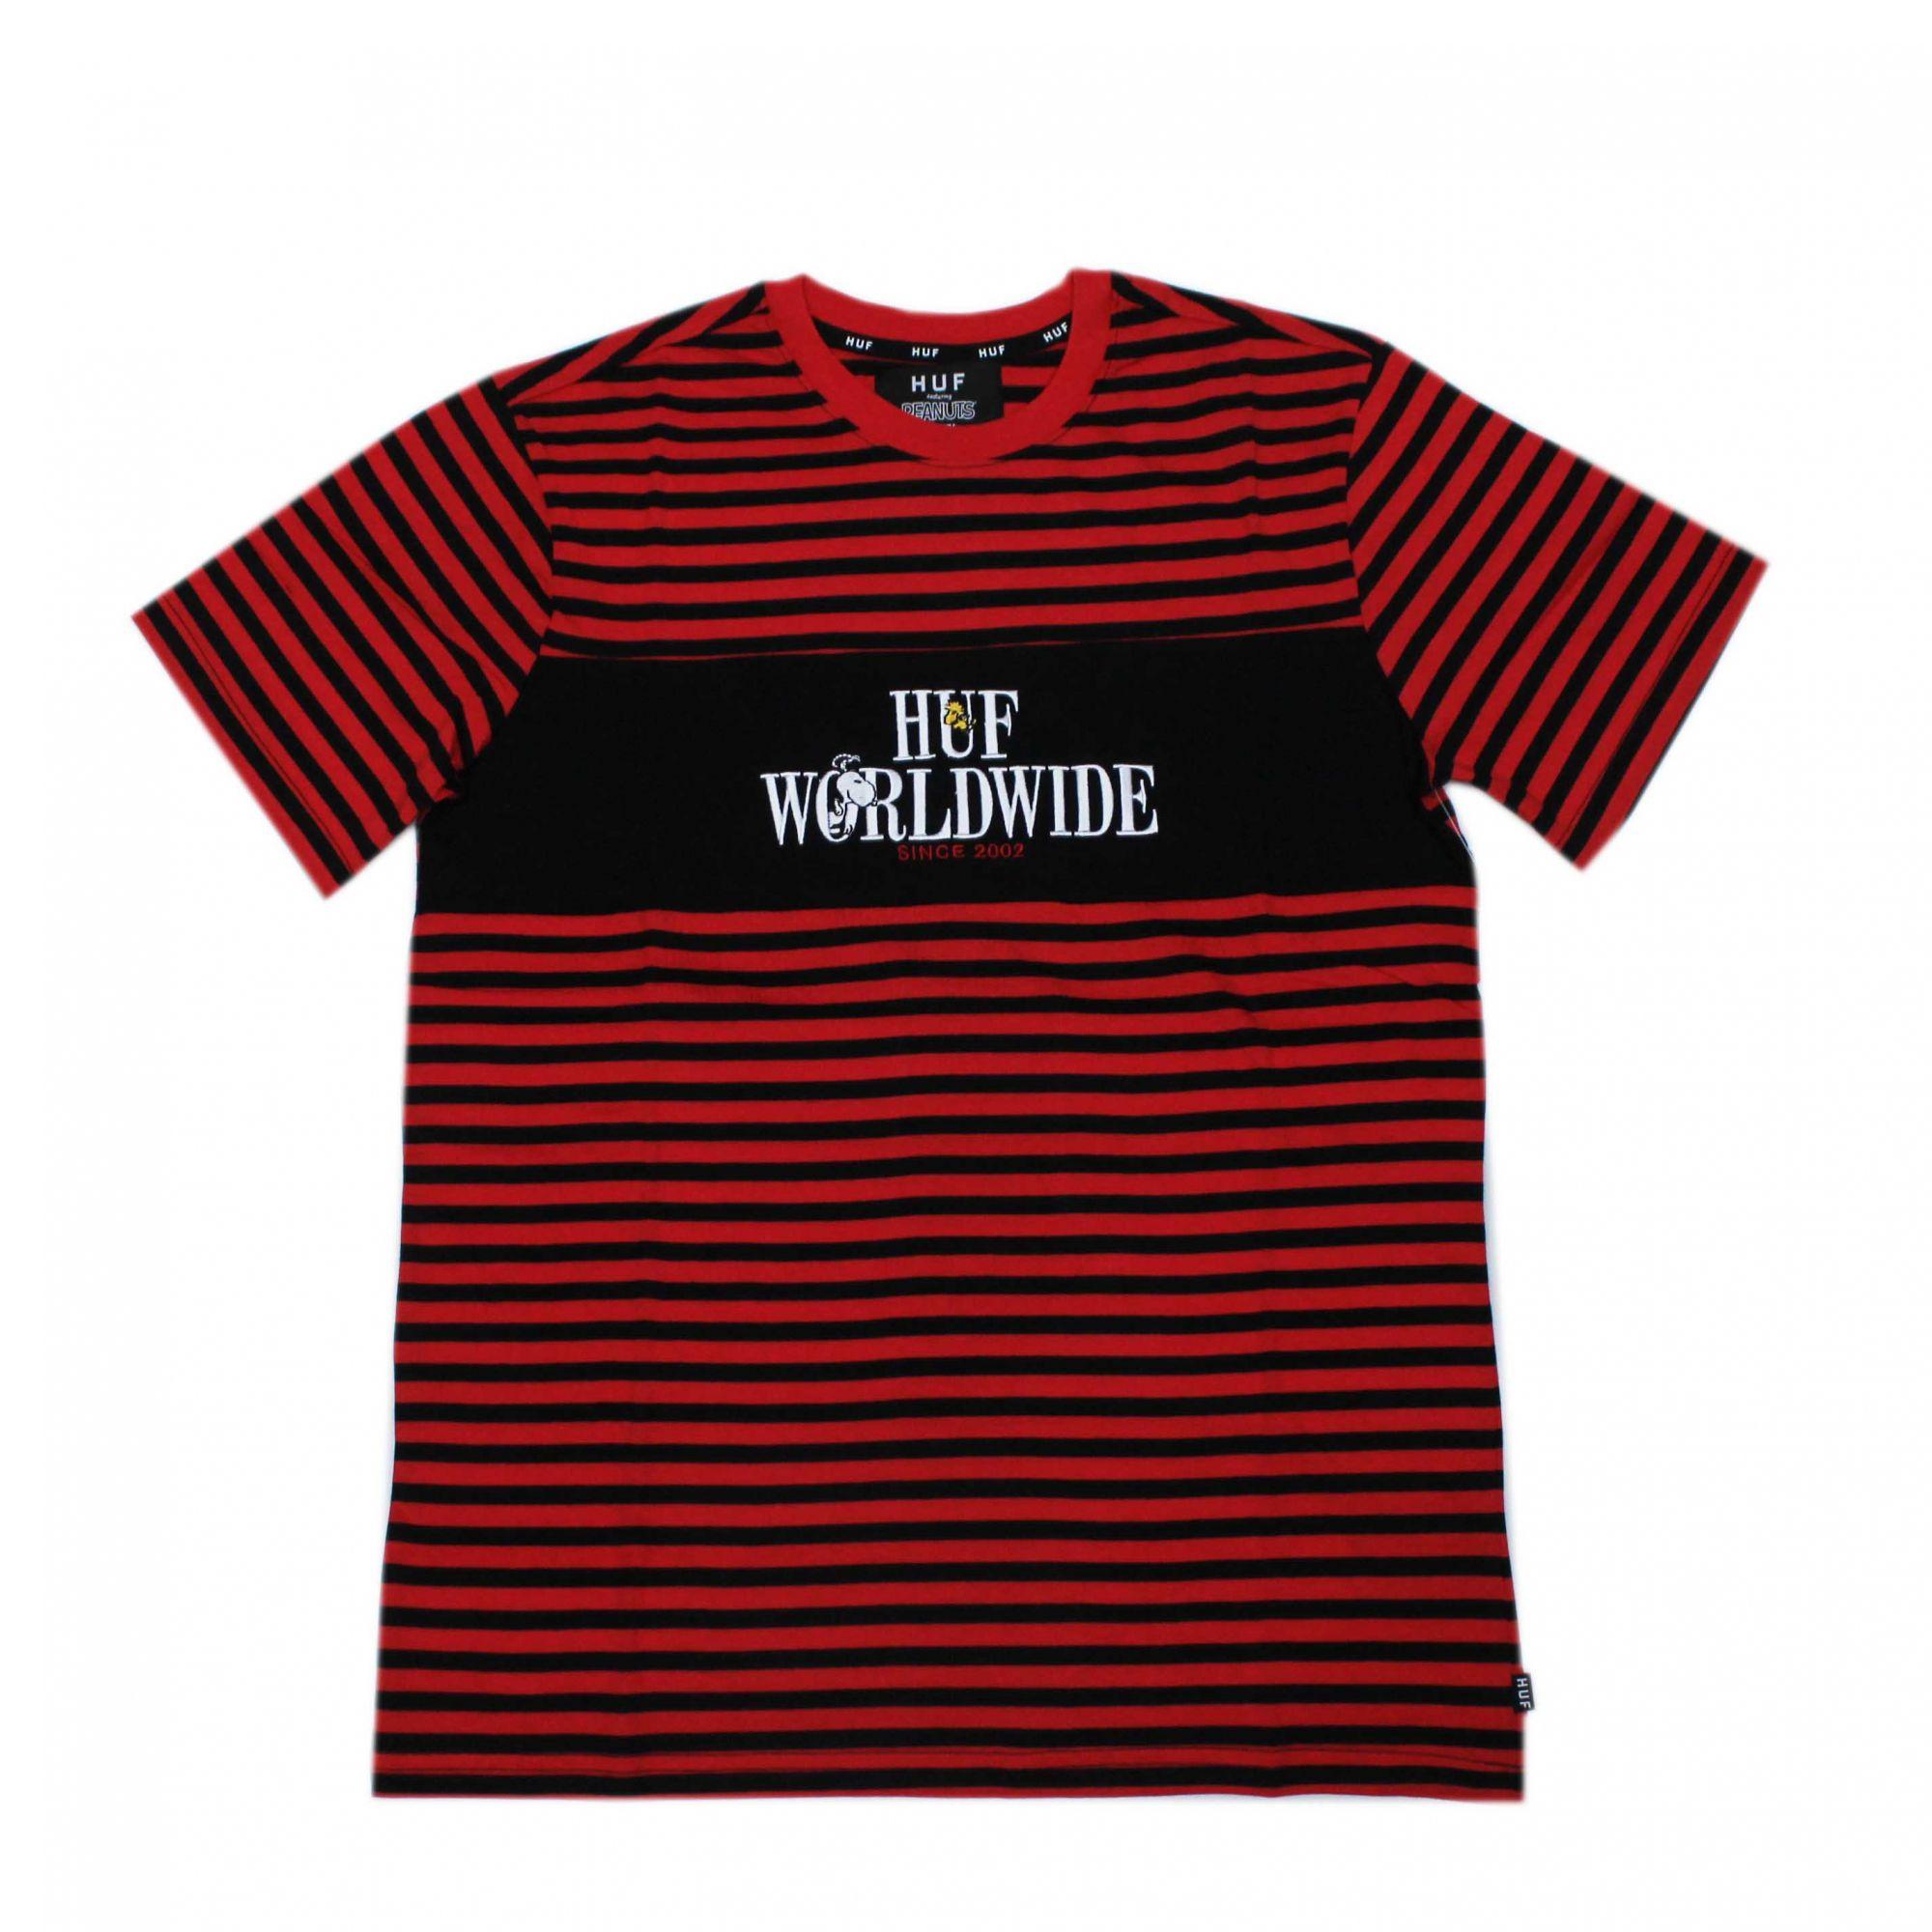 Camiseta HUF x Snoopy Party Animal - Vermelho/Preto (Importado)